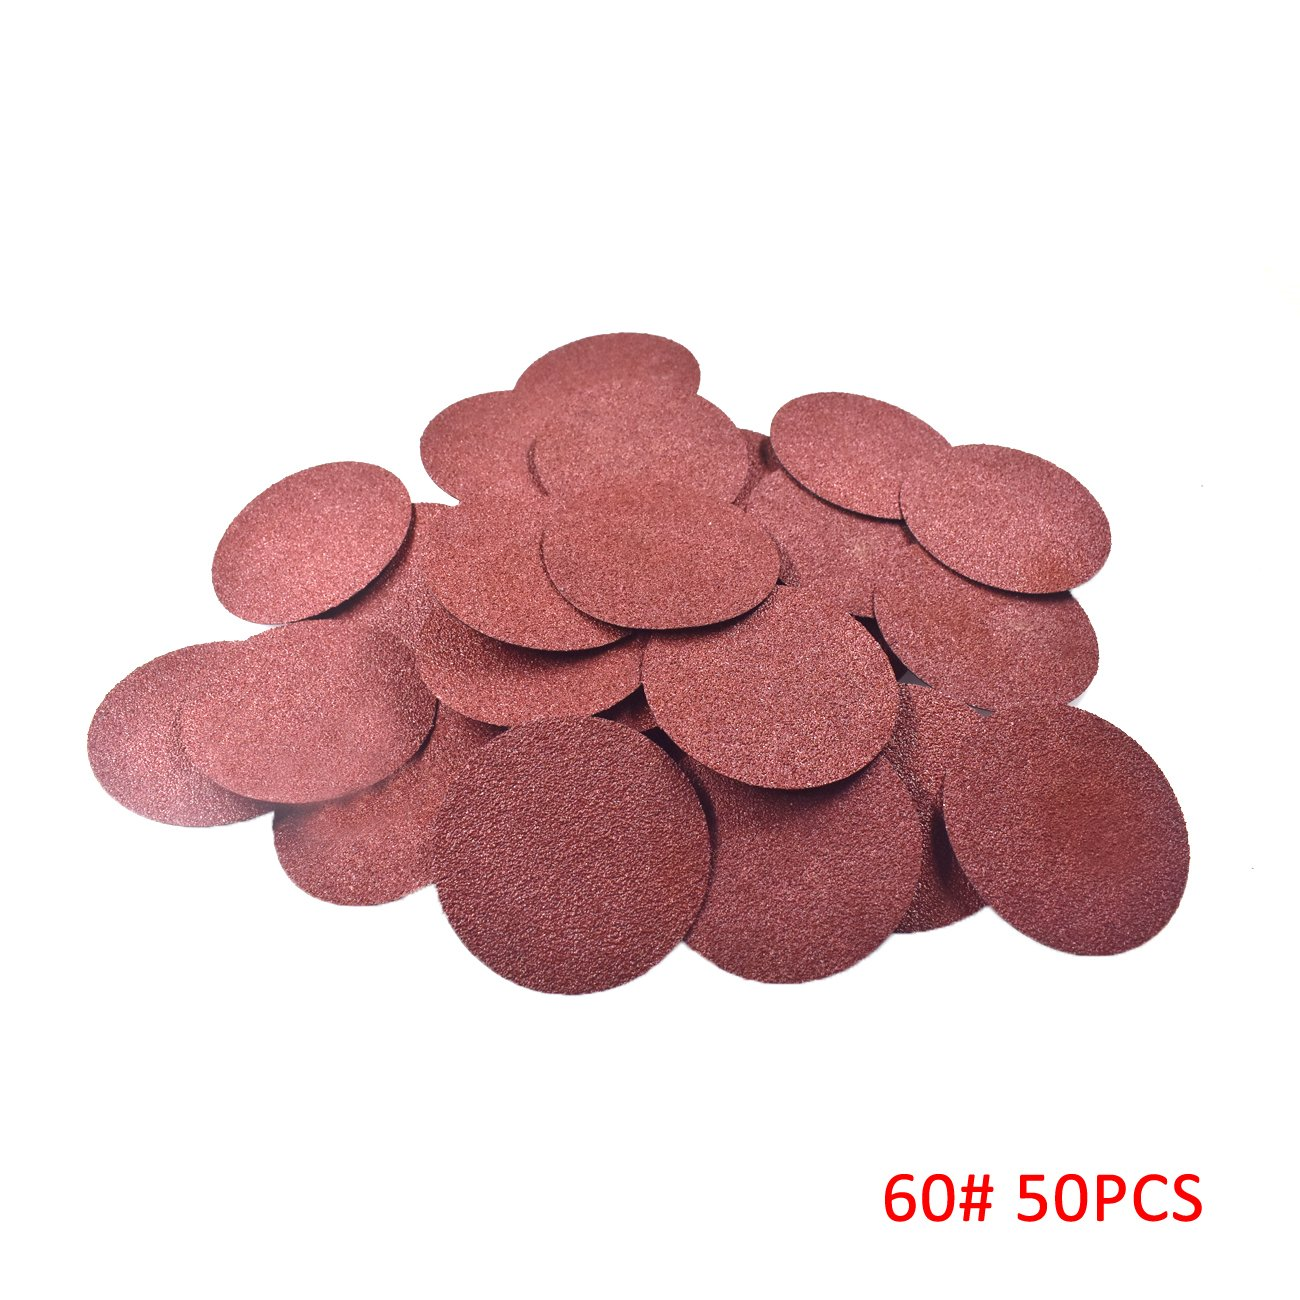 Supermotorparts 50 Pcs 3 Inch Roloc Discs Coarse 60 Grit R Type Sanding Abrasive Roll Lock